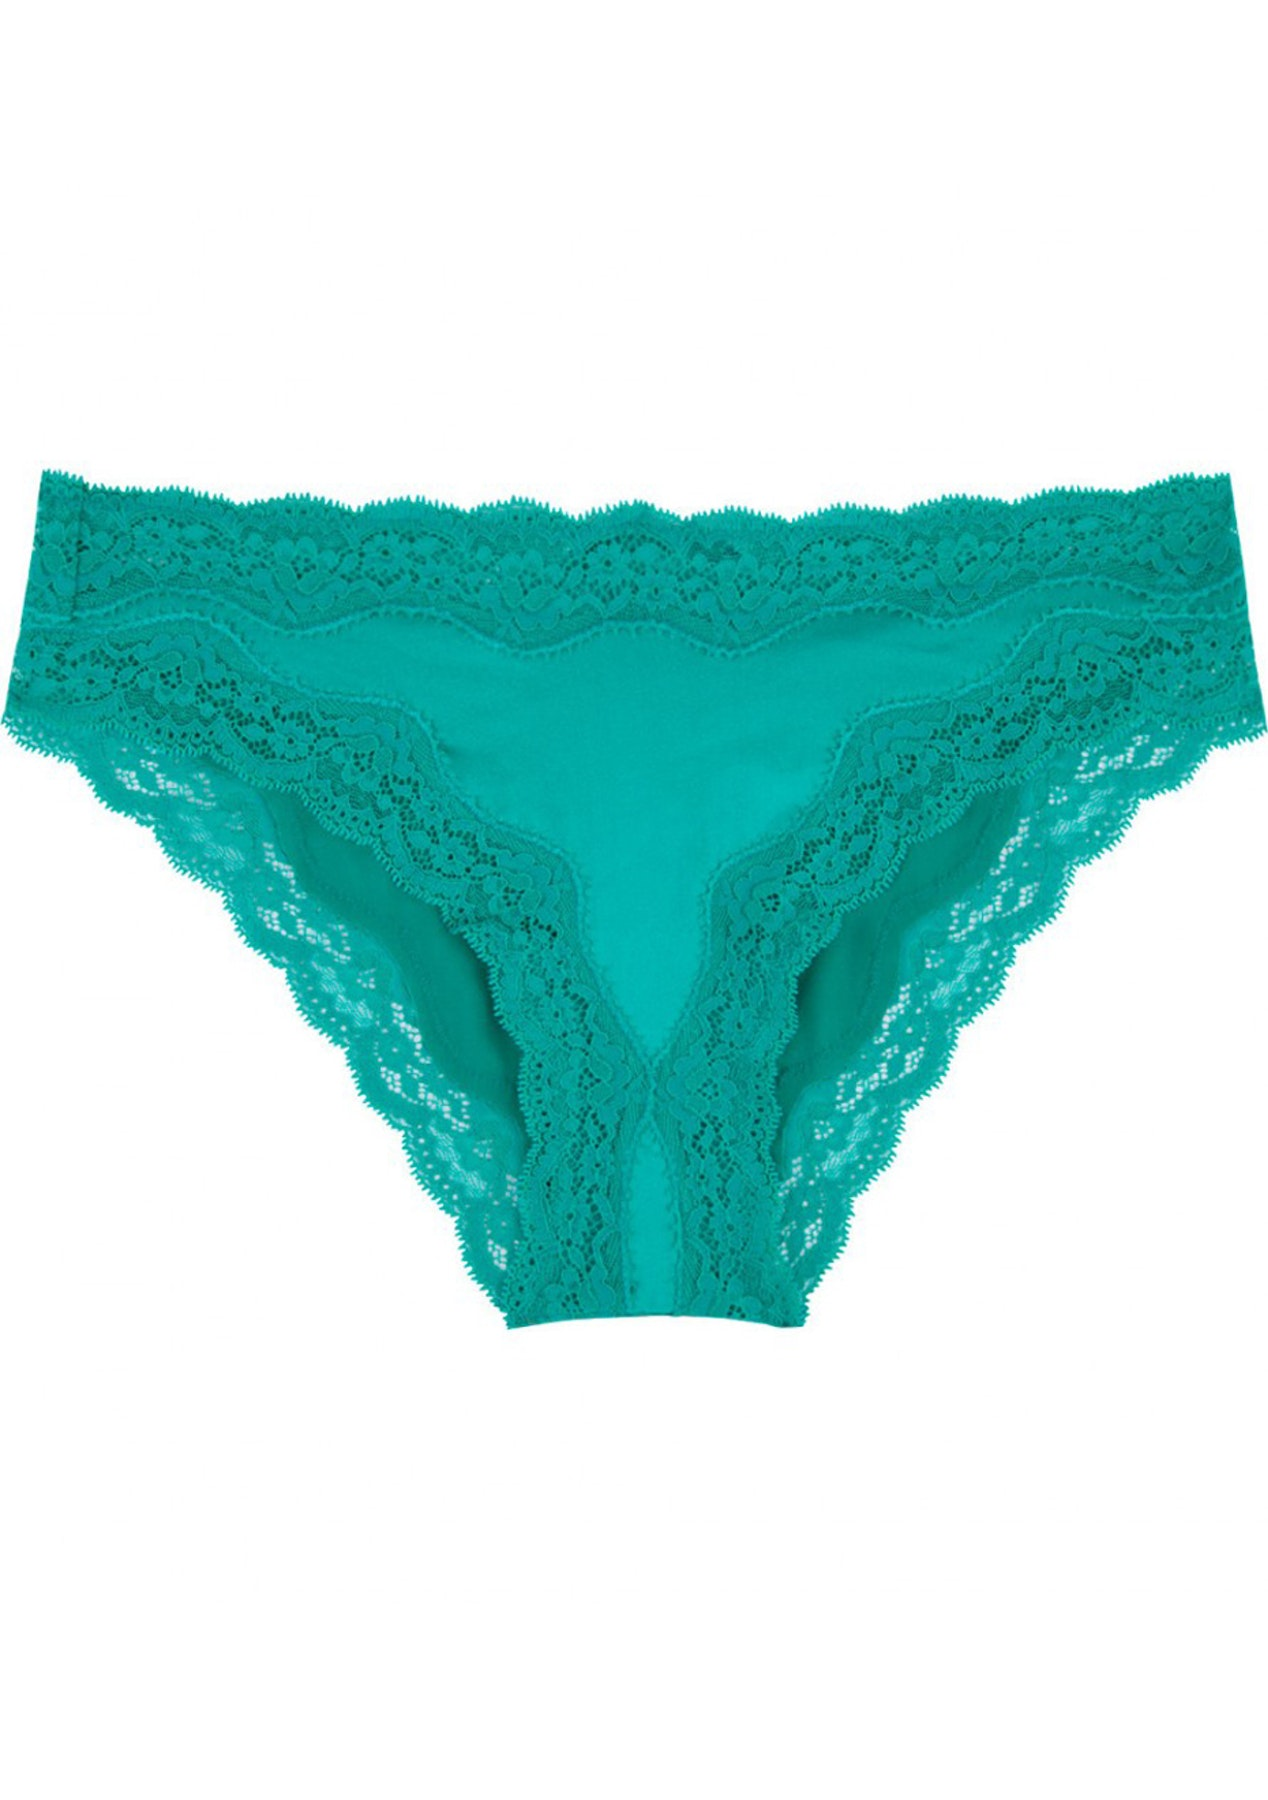 745cac0bb Stella McCartney Lingerie - Clara Whispering Bikini Brief - Dynasty Green -  Under  40 Underwear - Onceit